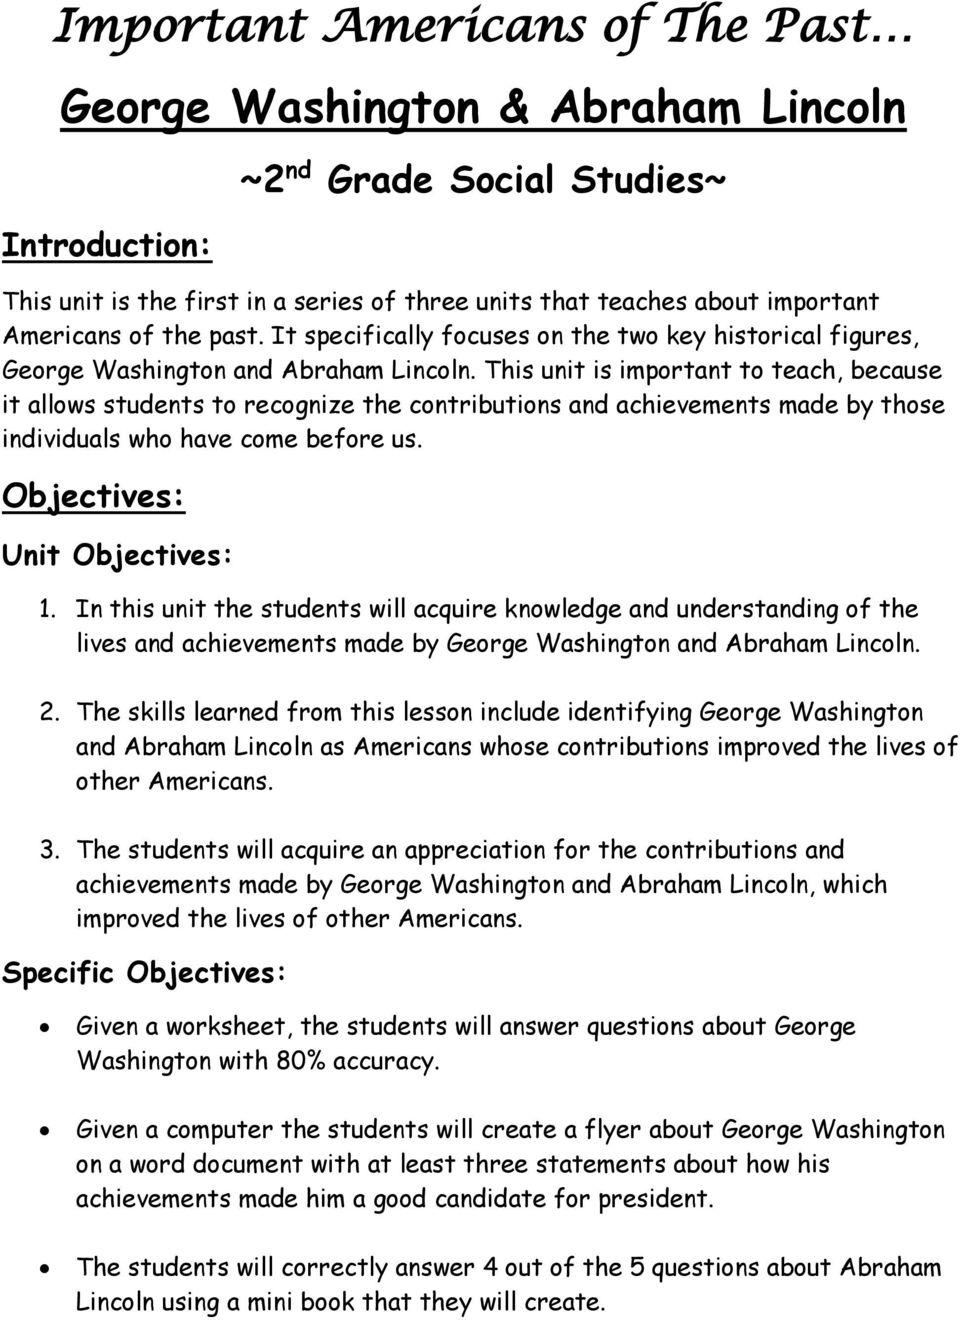 medium resolution of George Washington and Abraham Lincoln ~Unit Plan~ - PDF Free Download